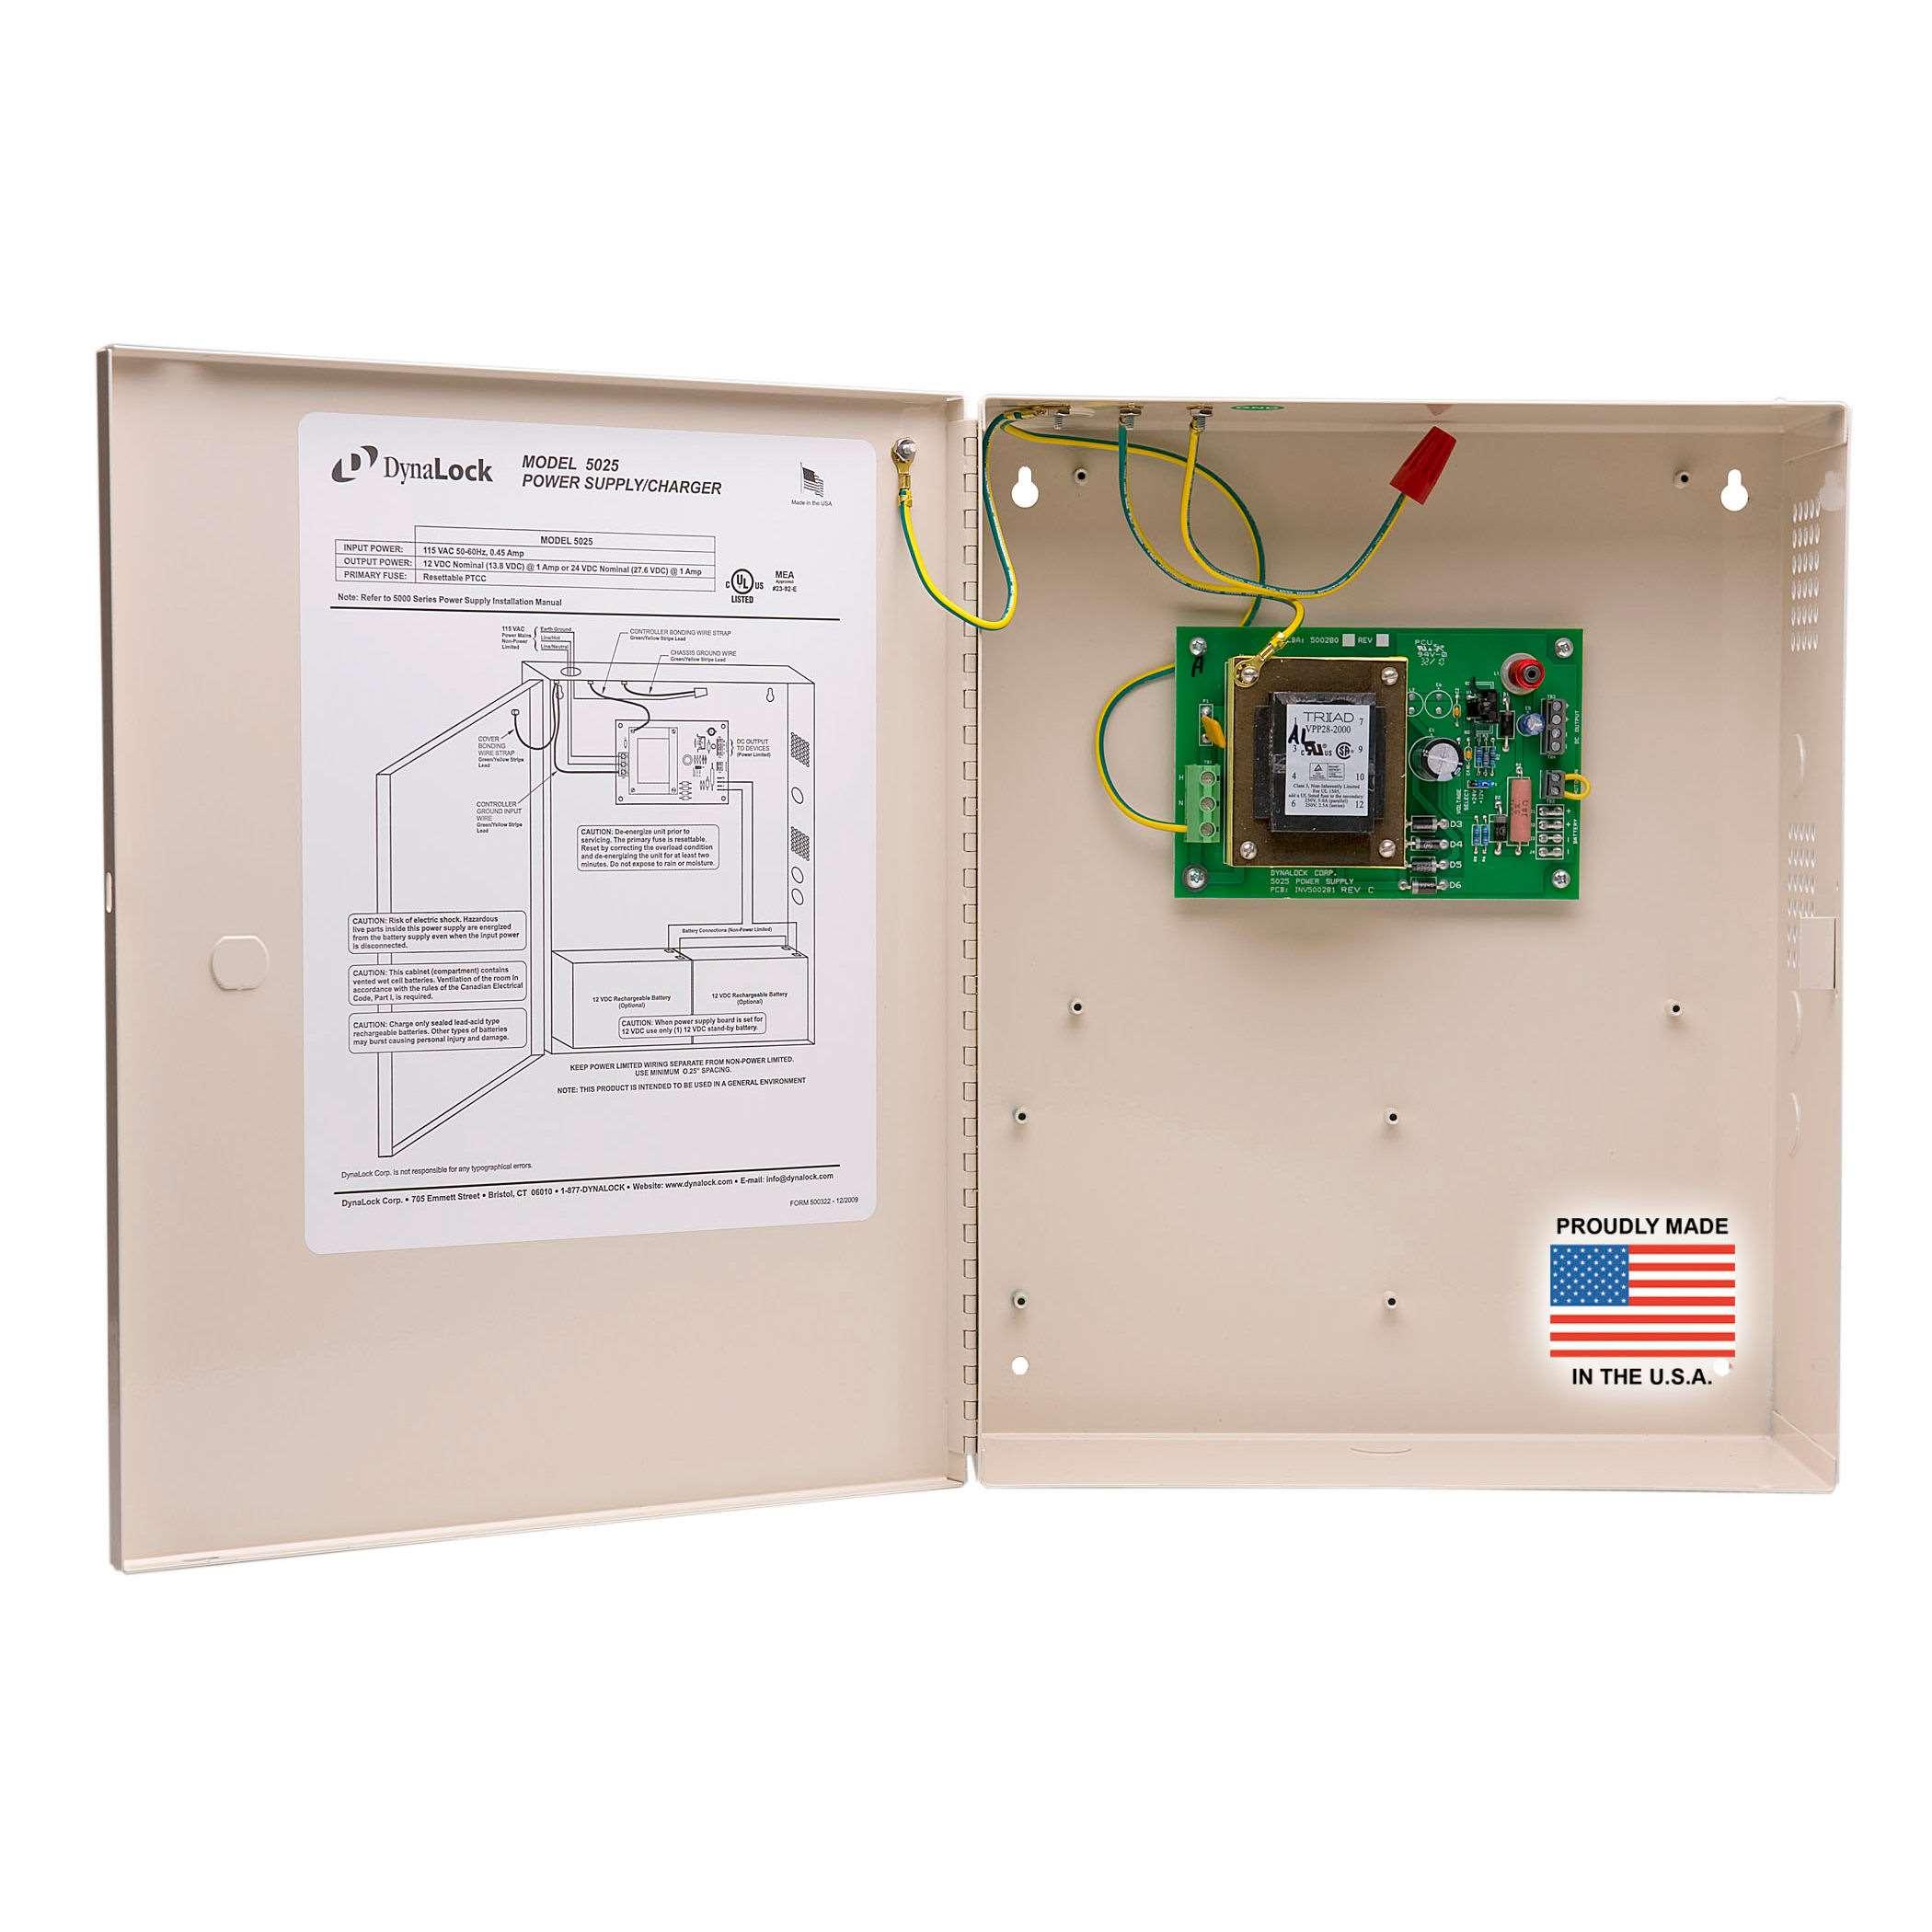 Dynalock 5025 Light Duty 1 Amp Power Supply Gokeyless 15 Volt Regulated